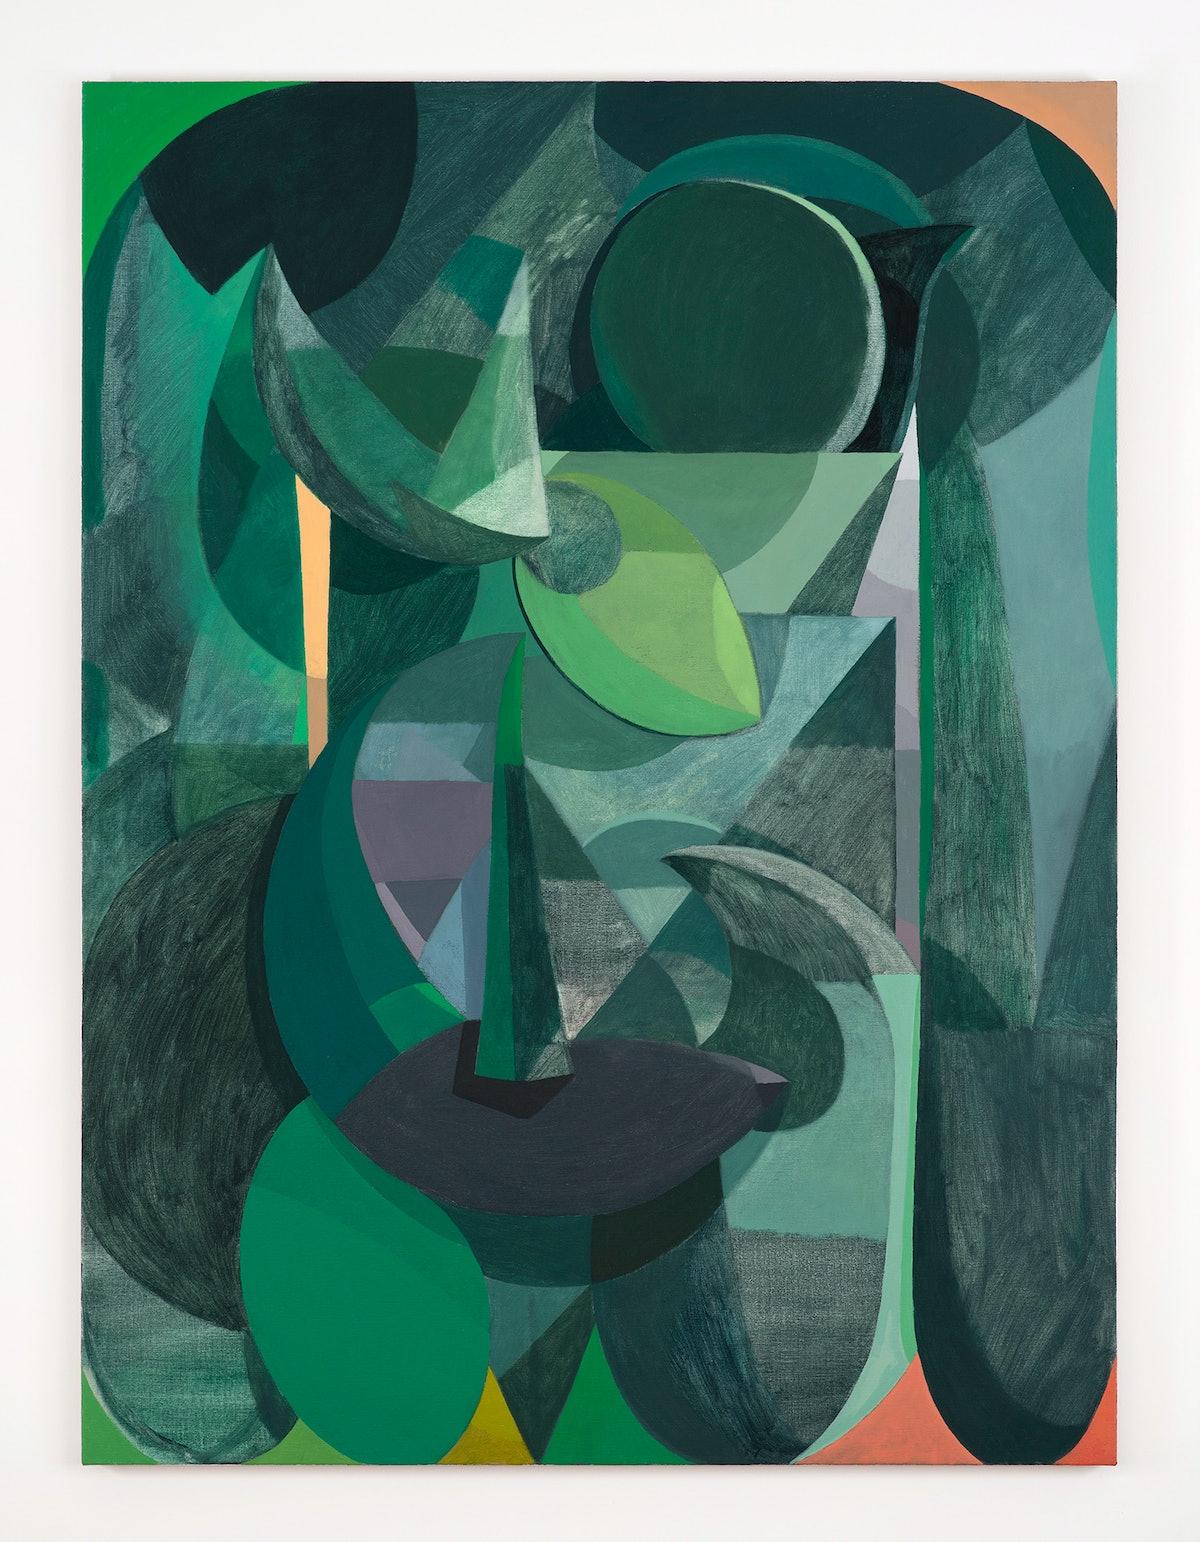 Sebastian Black's Big Green